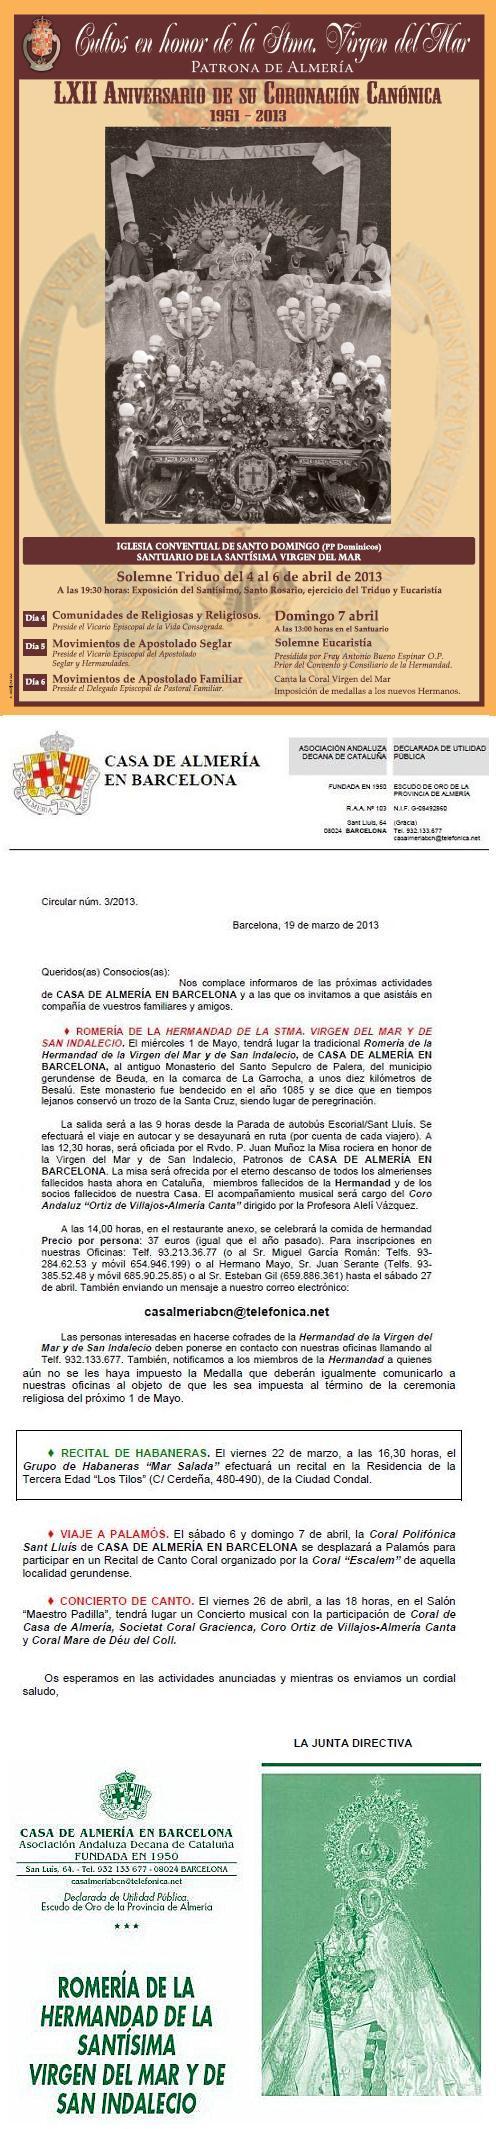 20130321122356-cartel-cultosvm-abril-2013-actividades-cab.jpg